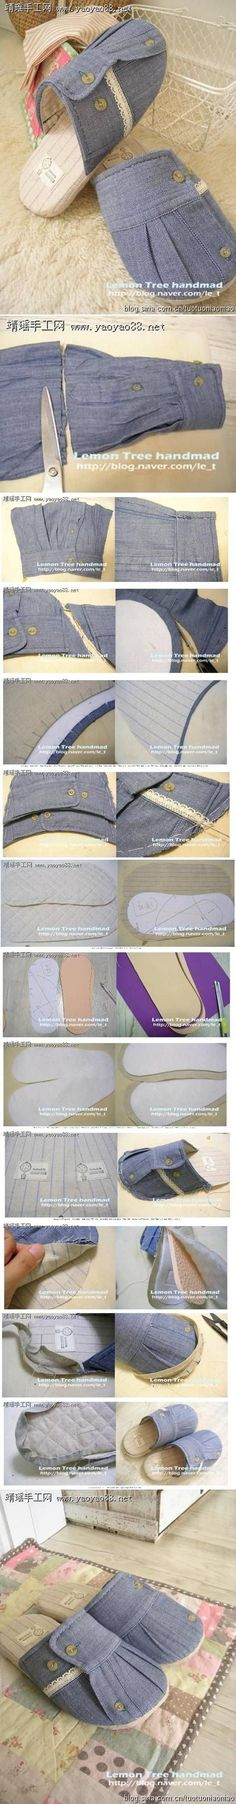 DIY Old Clothes Cuff Slipper